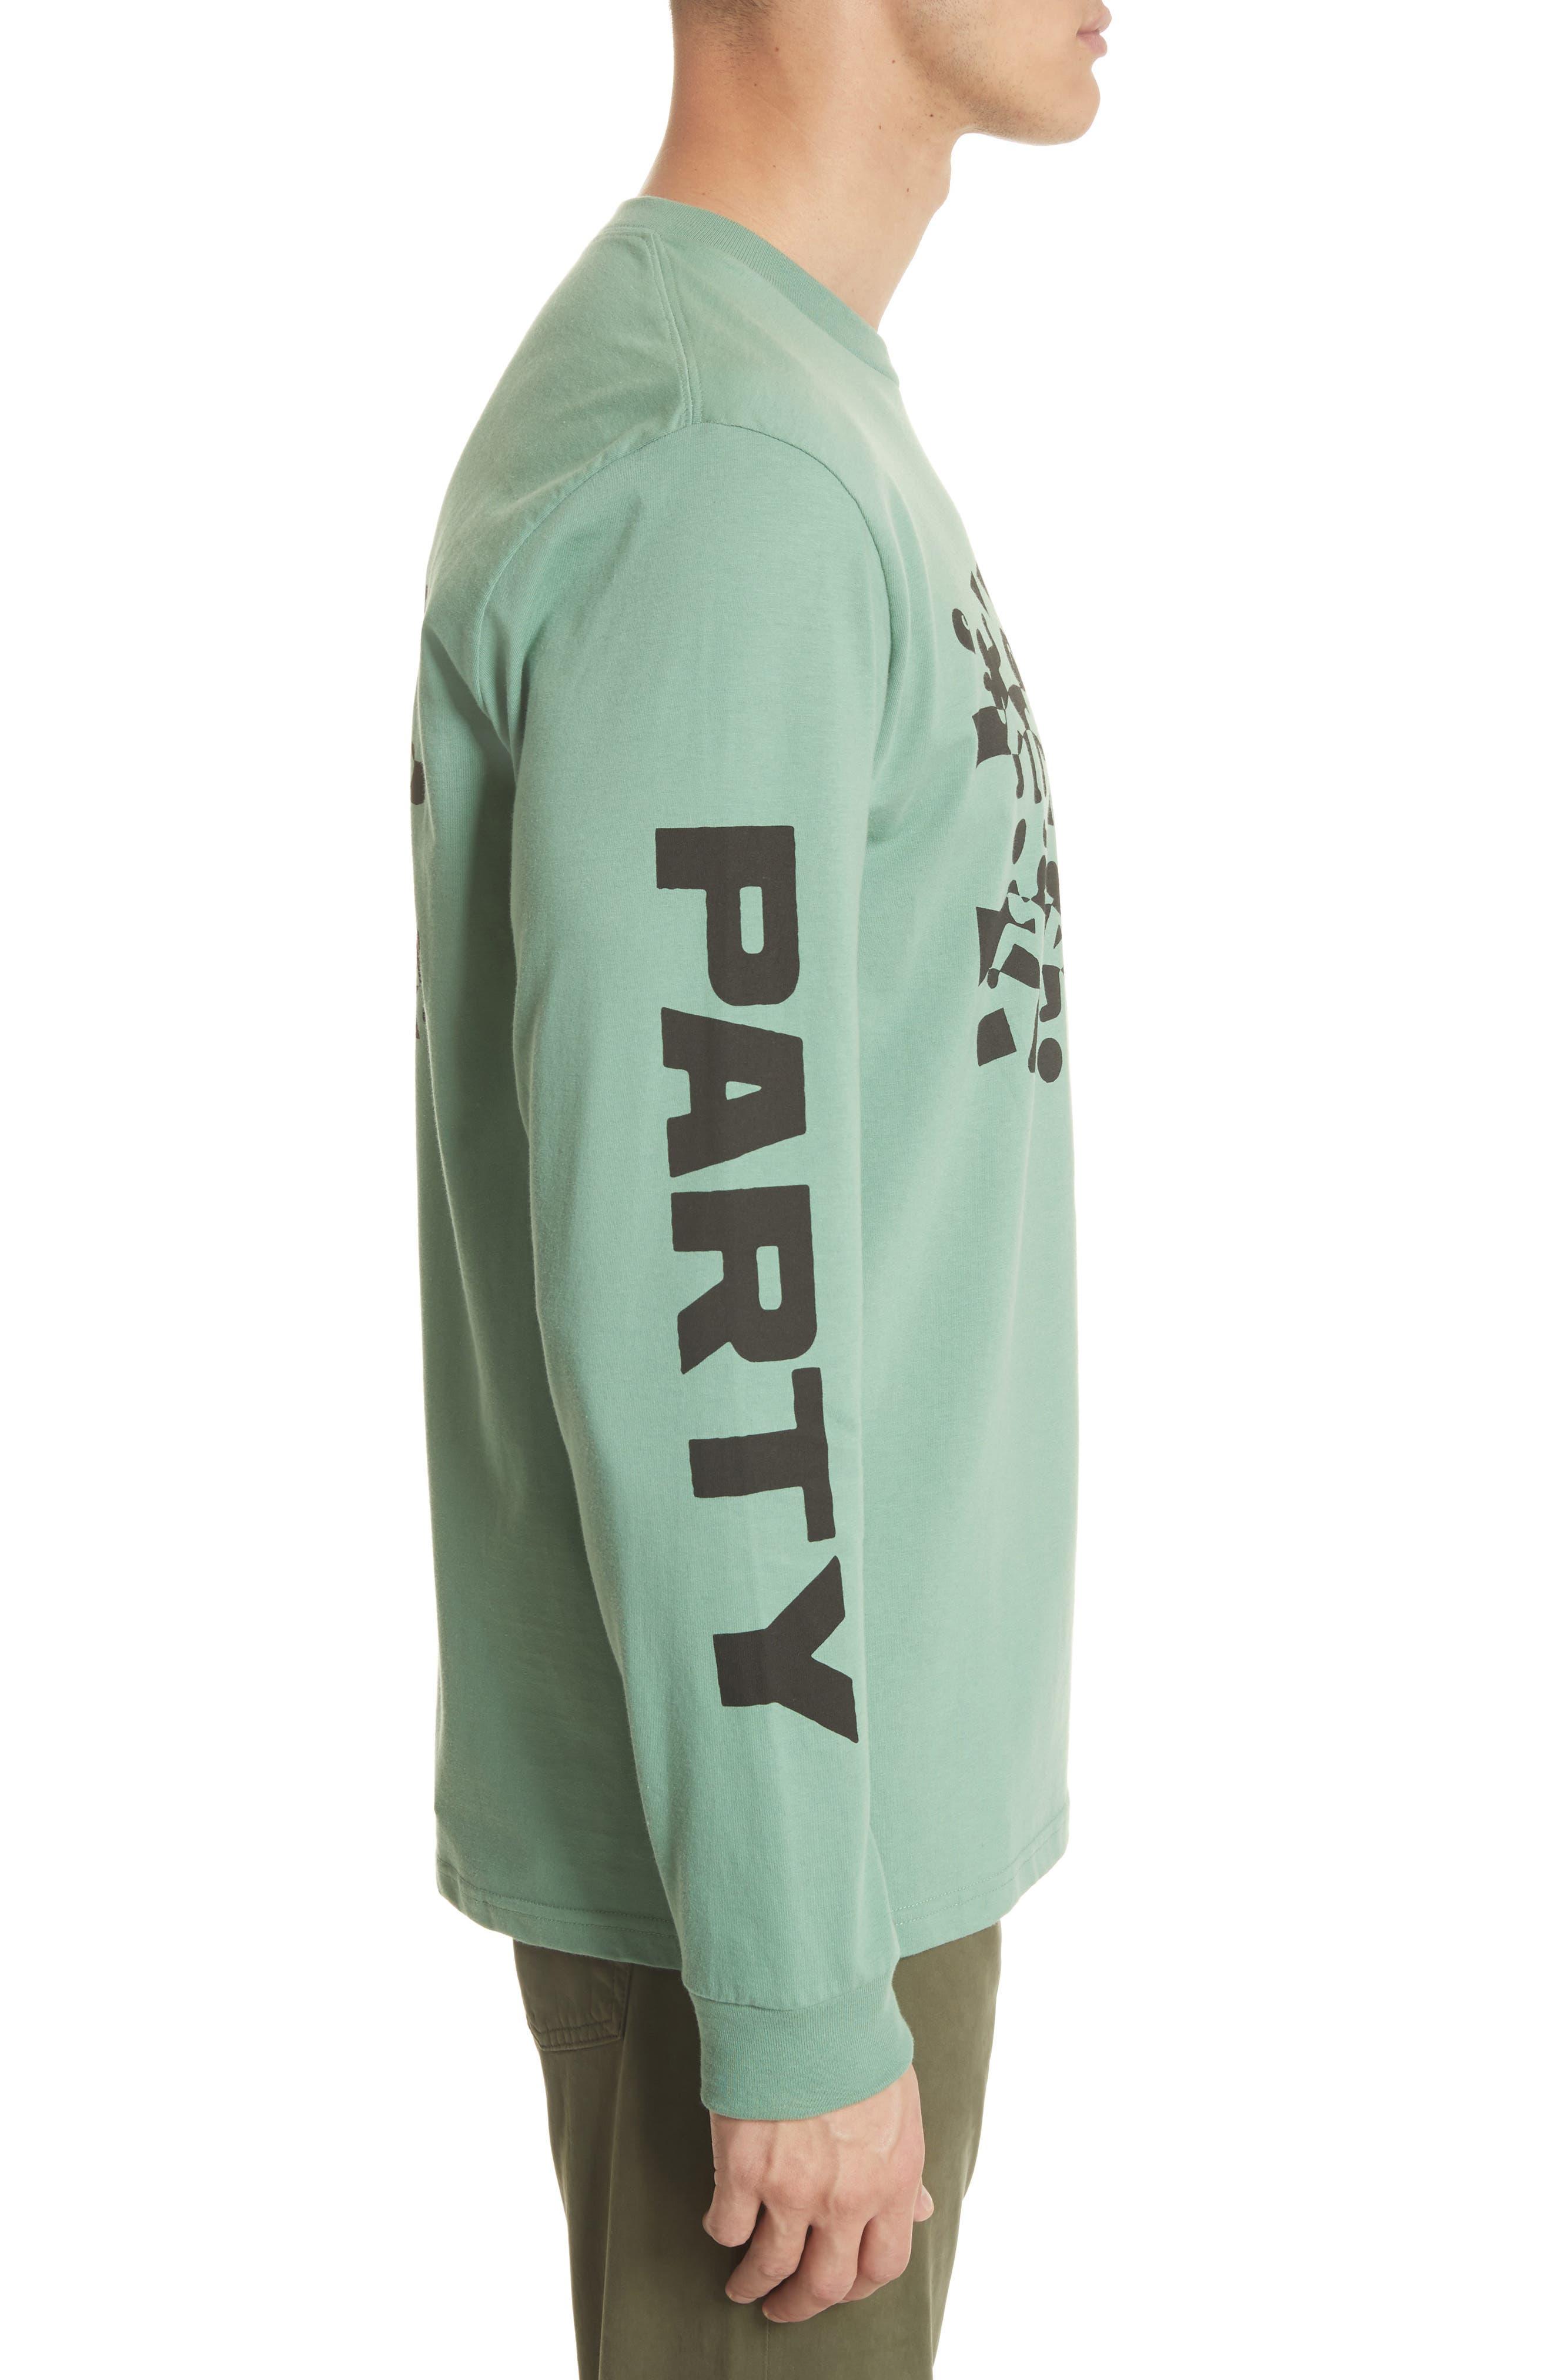 CARHARTT WORK IN PROGRESS,                             World Party T-Shirt,                             Alternate thumbnail 3, color,                             340